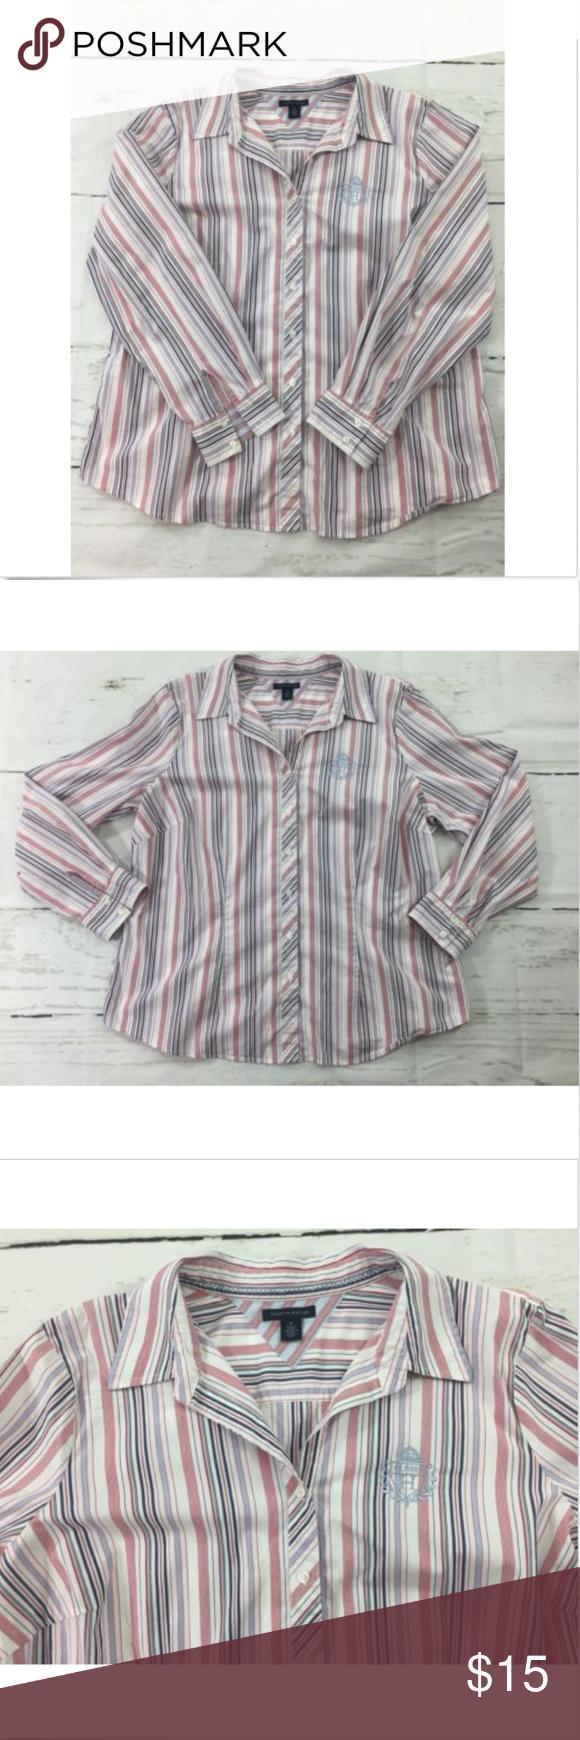 Tommy Hilfiger Red Striped Dress Shirt Size 18 Dress Shirt Sizes